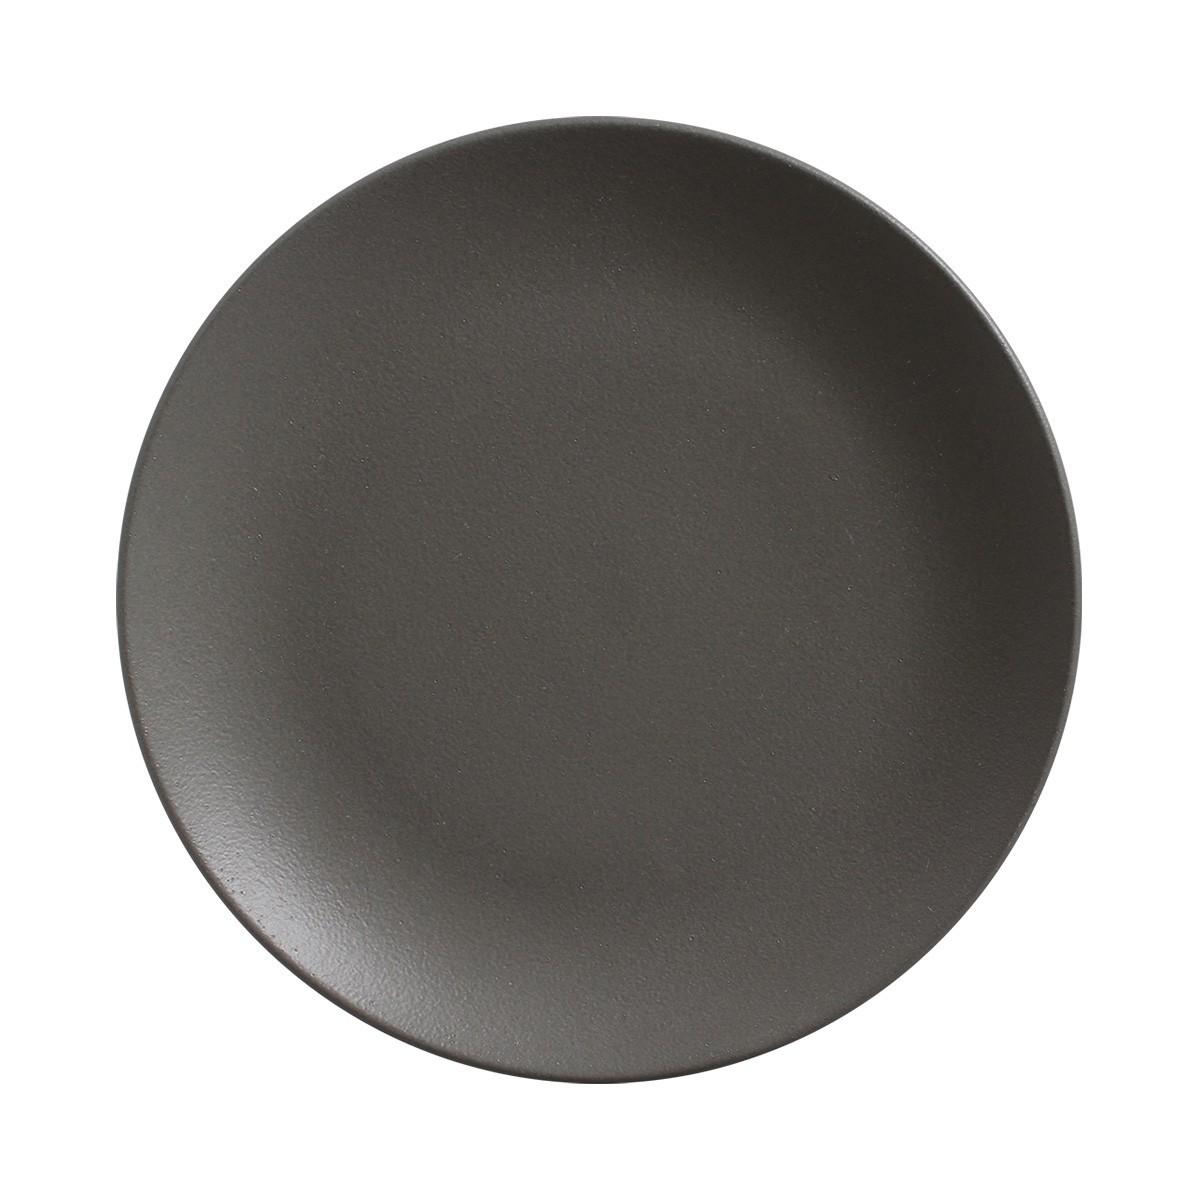 Jogo 6 Pratos Sobremesa Coup Stoneware Urban Graphite  20cm - Porto Brasil